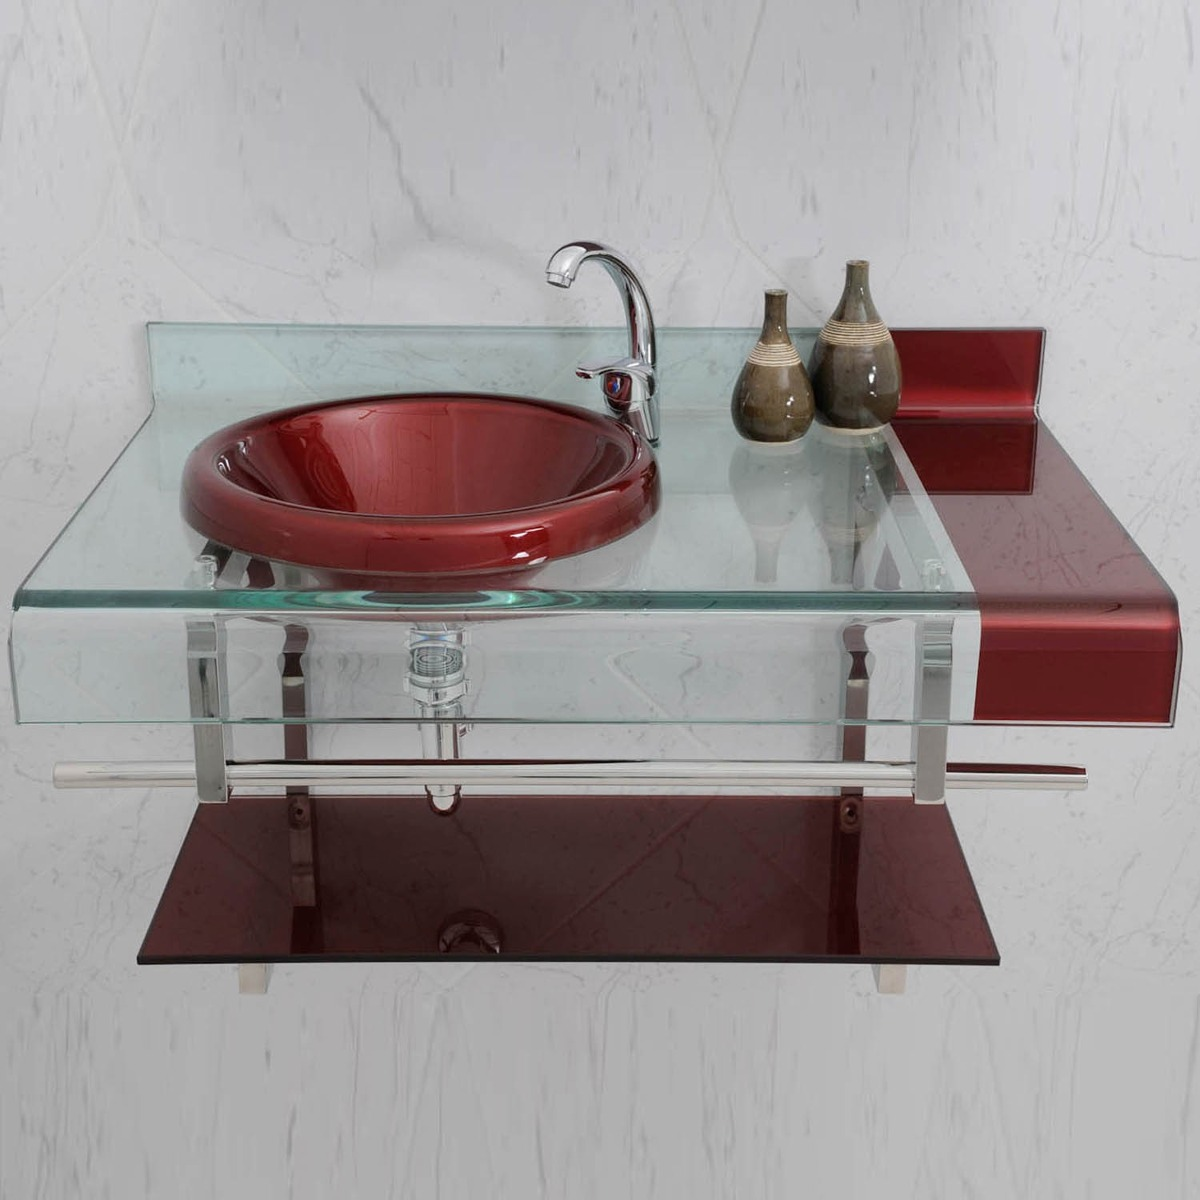 Armario pia Bancada Banheiro Astra Estilo Chopin 70cm  R$ 899,00 em Mercad -> Gabinete Para Pia De Banheiro Casas Bahia